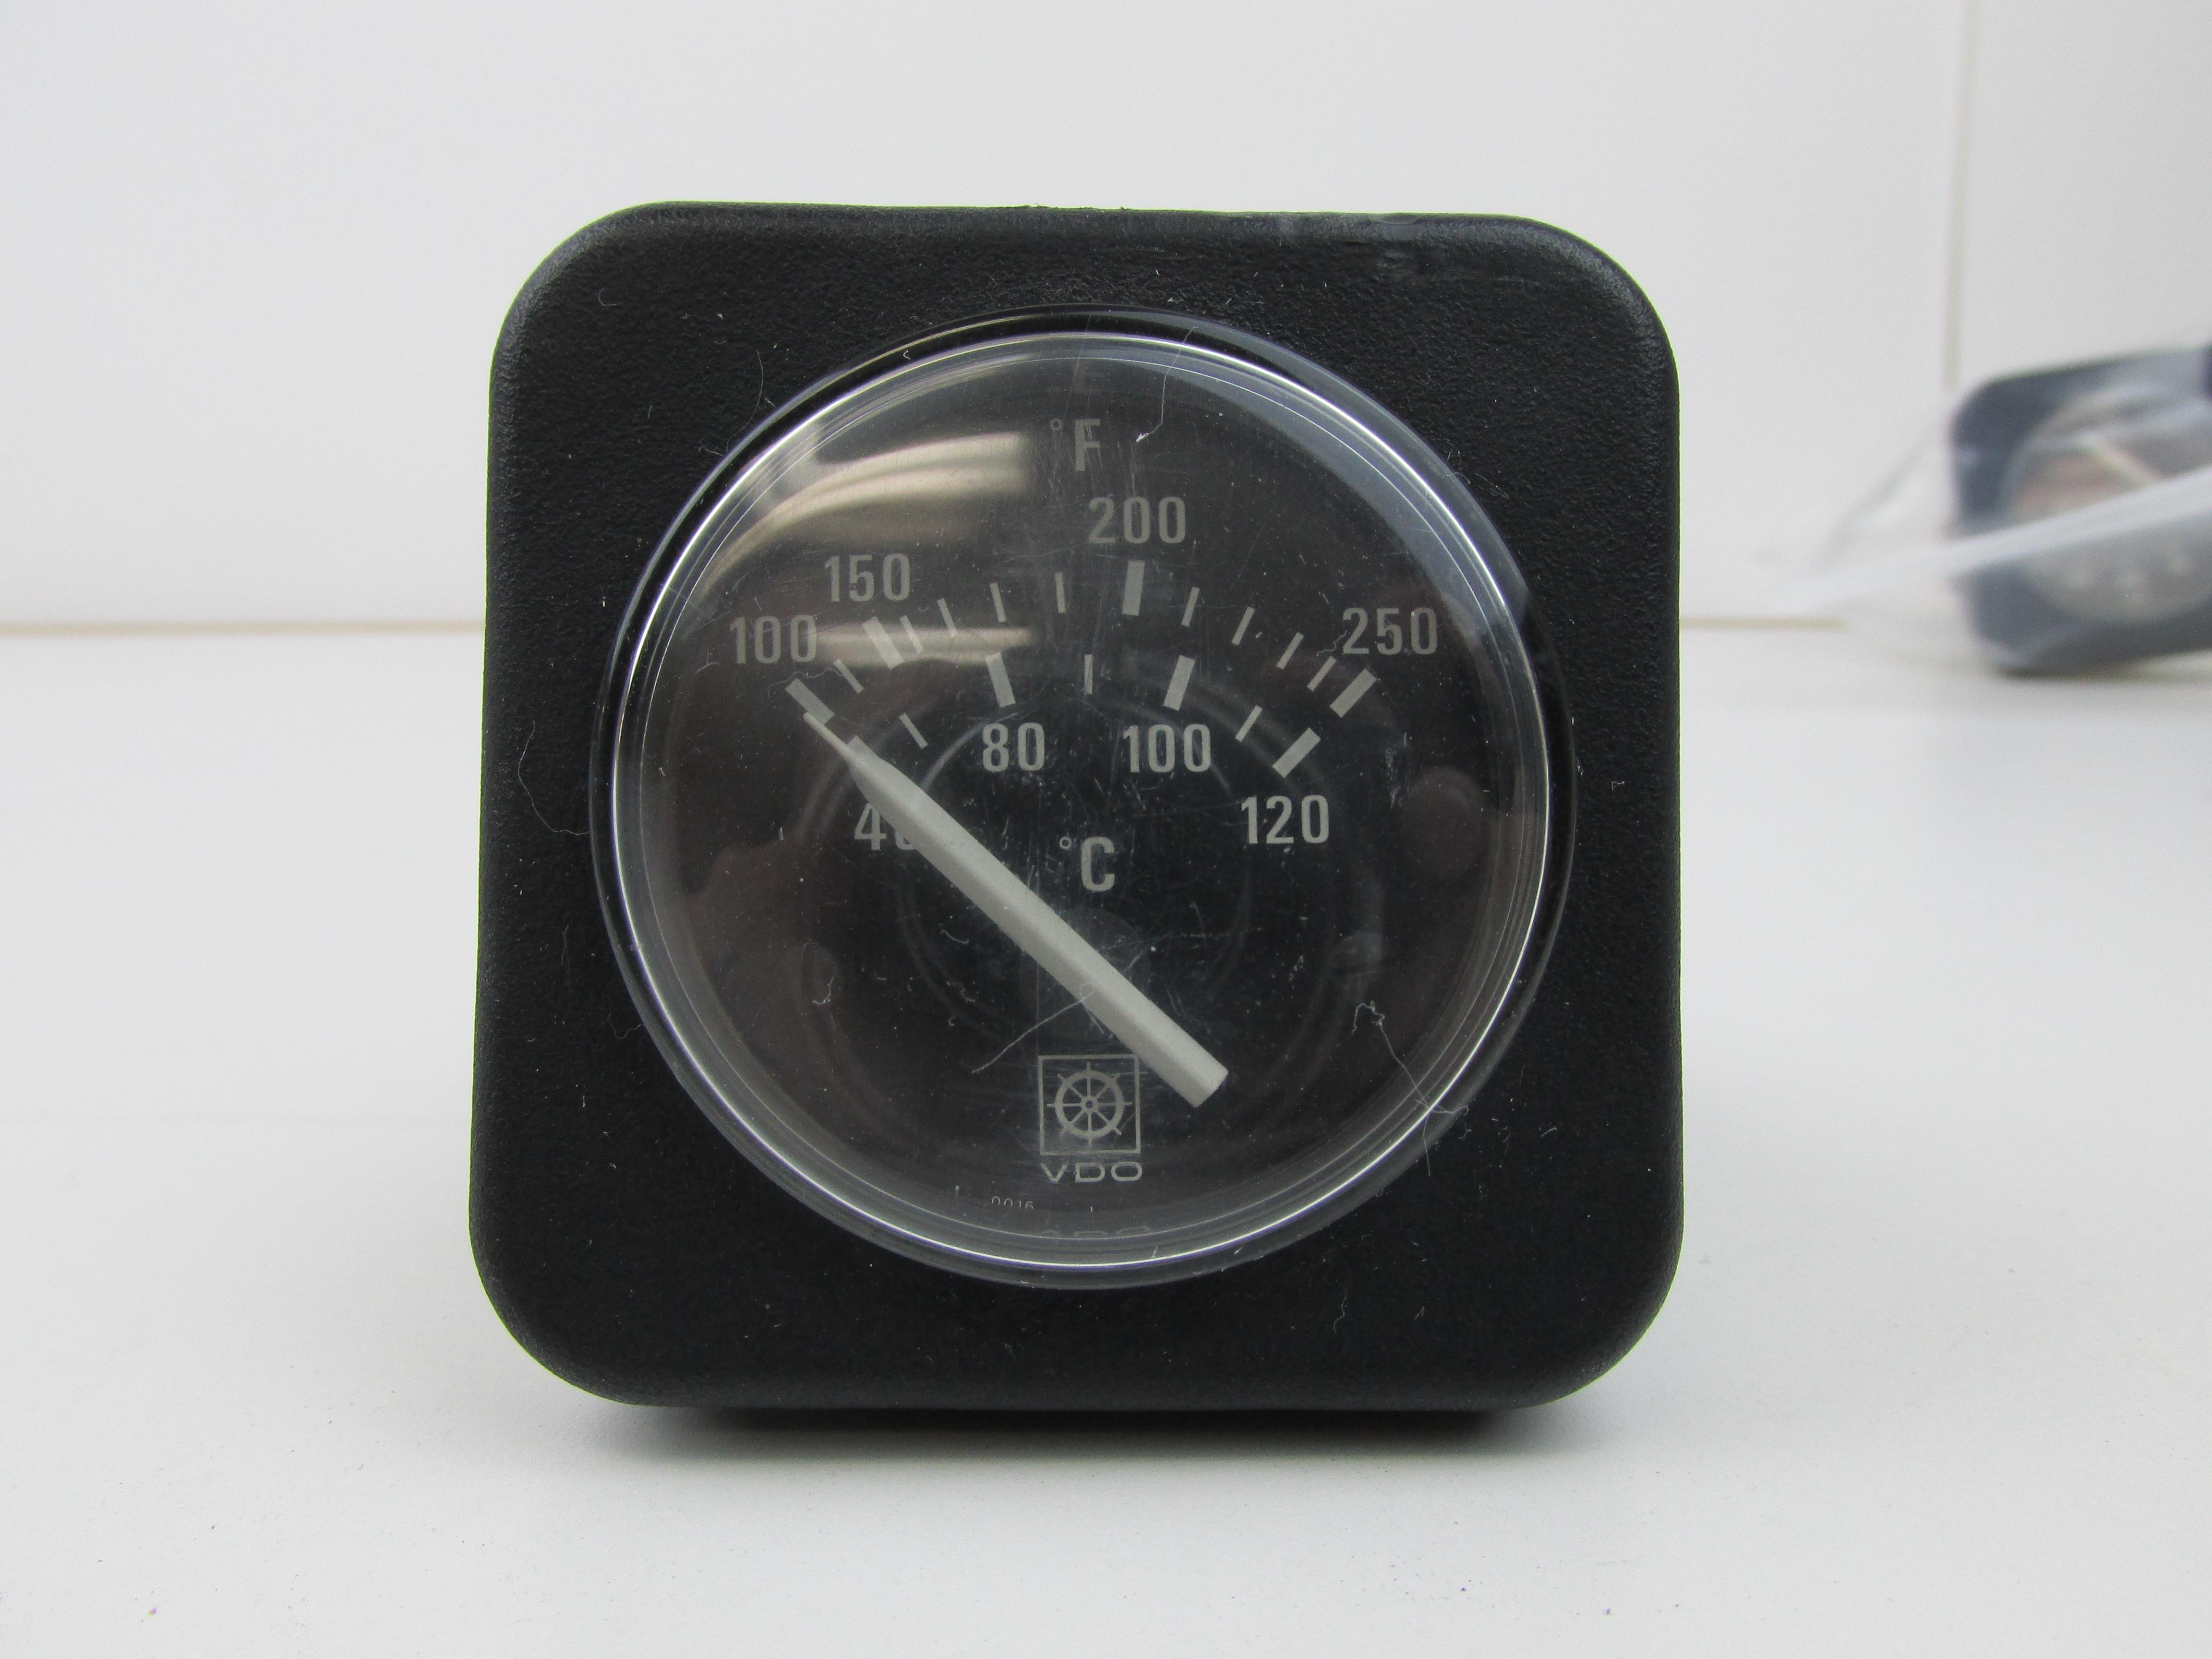 Cummins Vdo 0 250f Temperature Gauge Seaboard Marine Oil Temp Wiring Diagrams